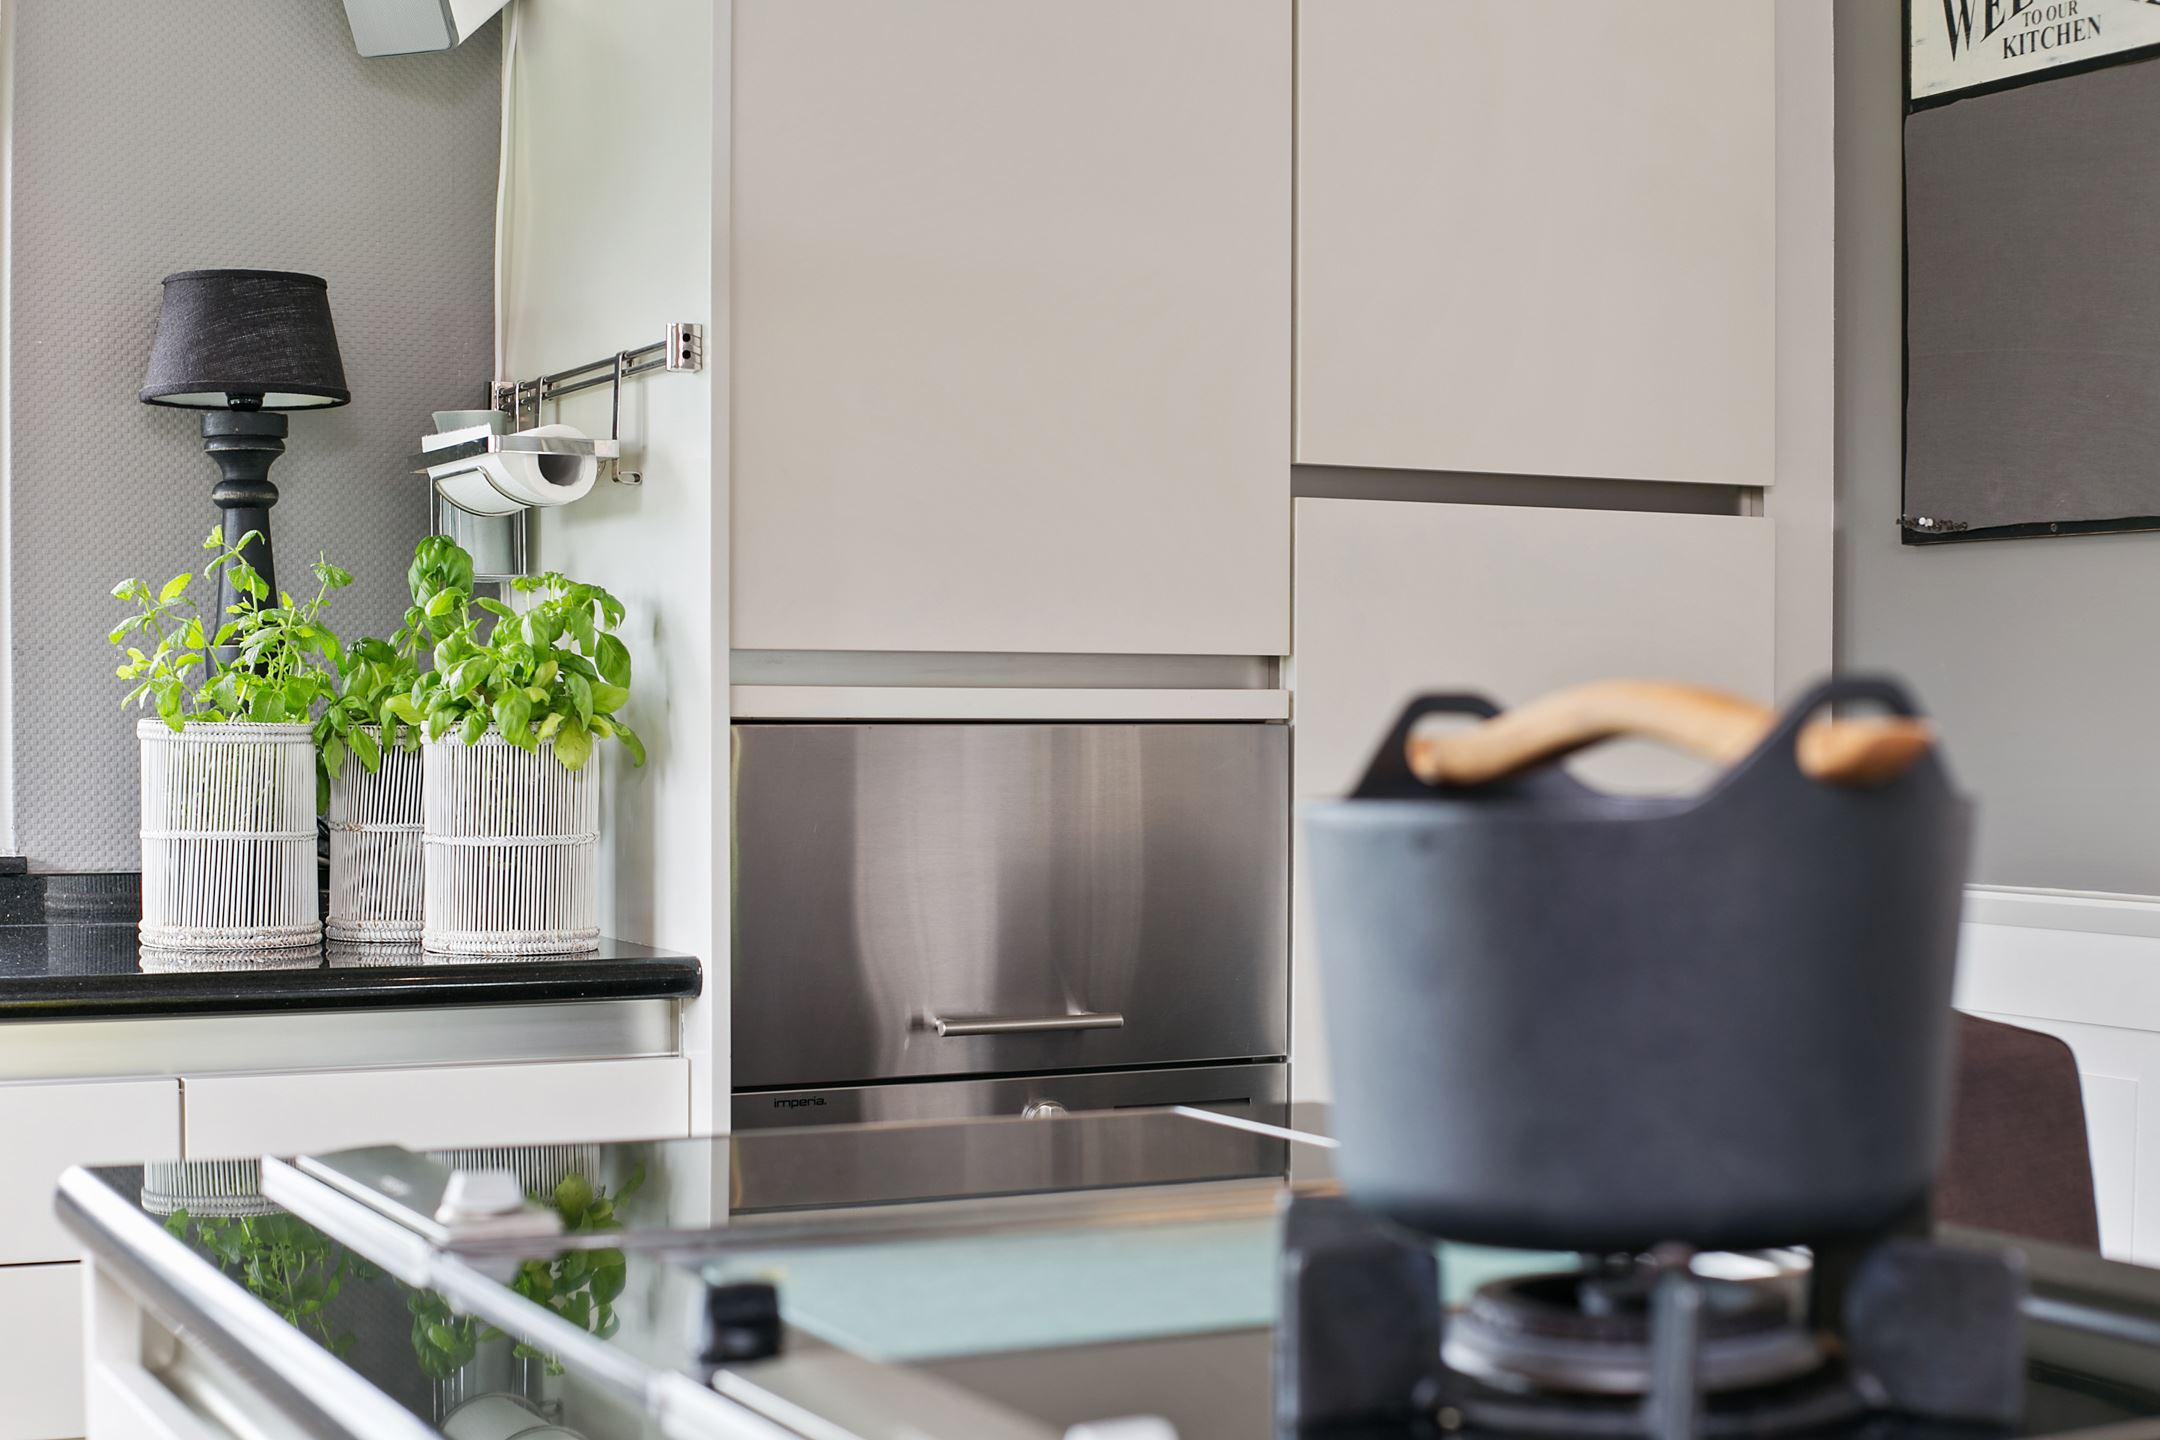 кухня встроенная техника